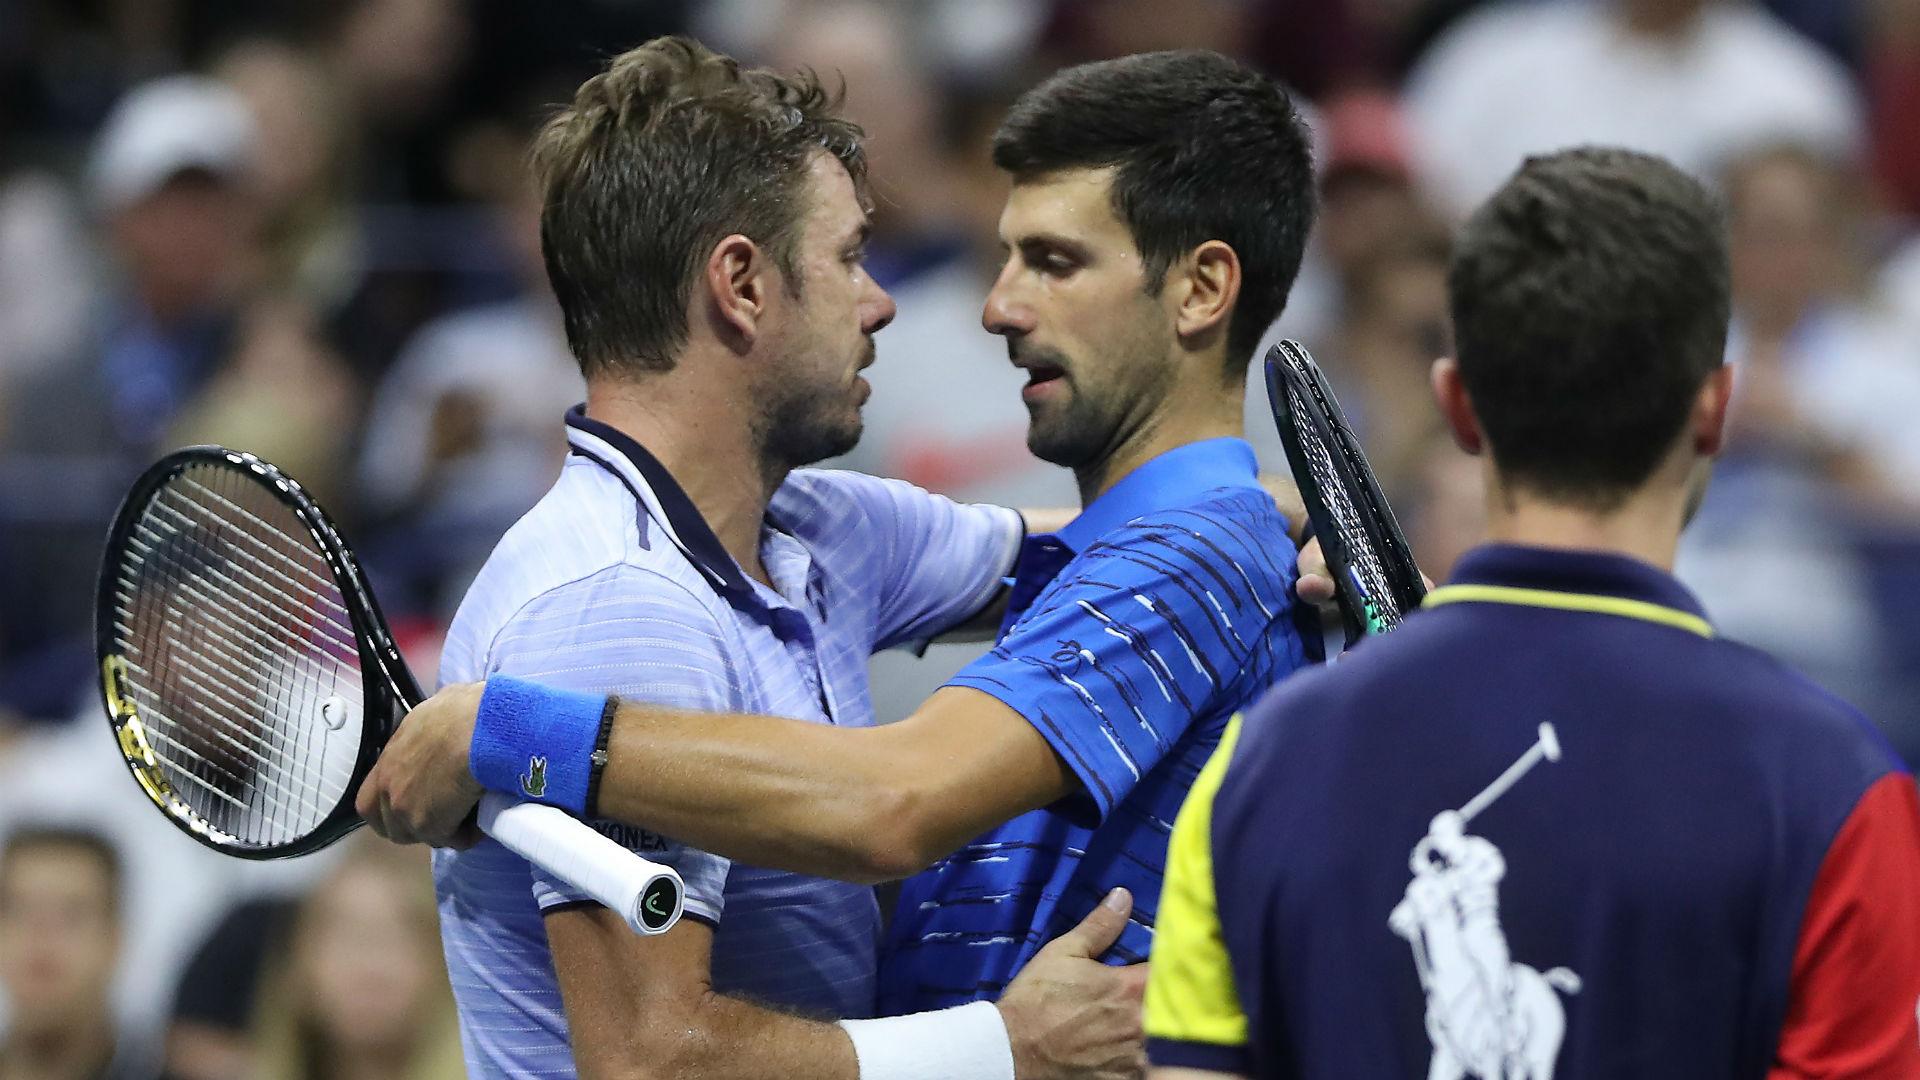 U.S. Open 2019: Novak Djokovic in 'constant pain' for weeks with shoulder issue